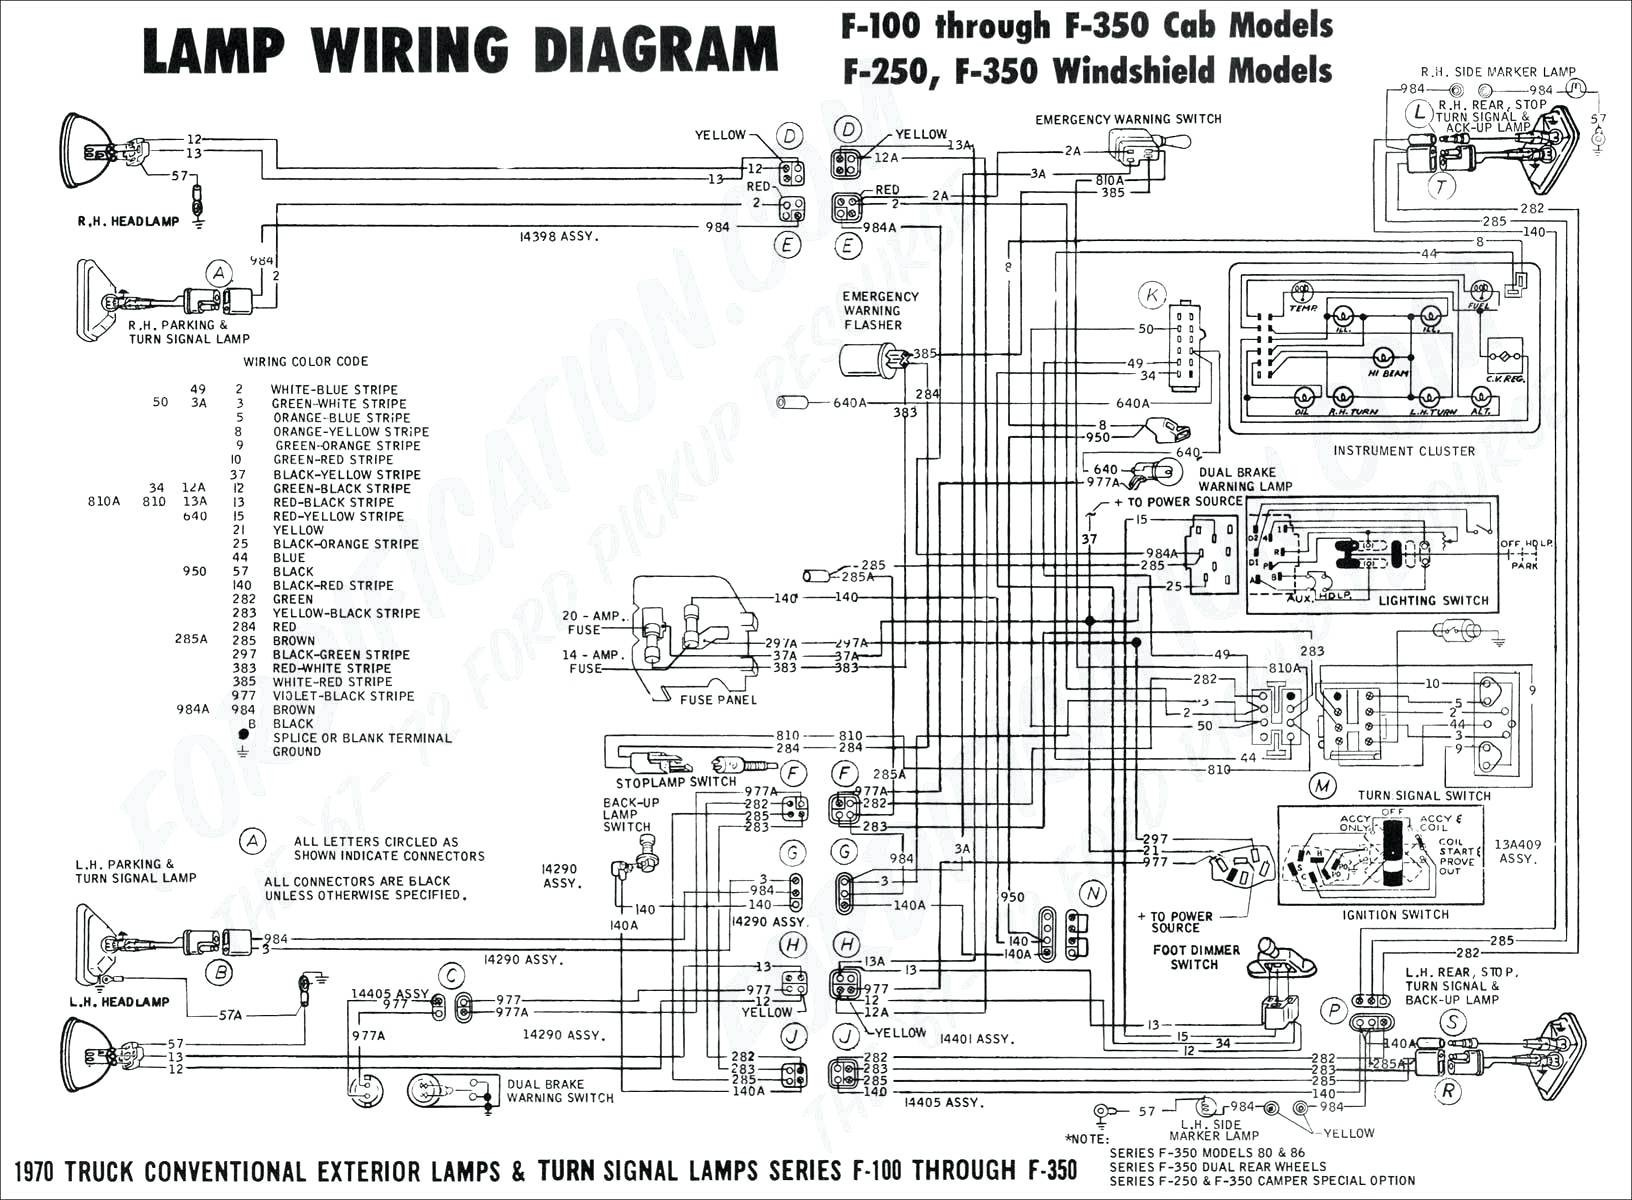 Pontiac Aztek Engine Diagram Wiring Diagram for 1995 Pontiac Bonneville Wiring Schematics Diagram Of Pontiac Aztek Engine Diagram Daihatsu Terios Fuse Box Diagram Automotive Wiring Diagrams